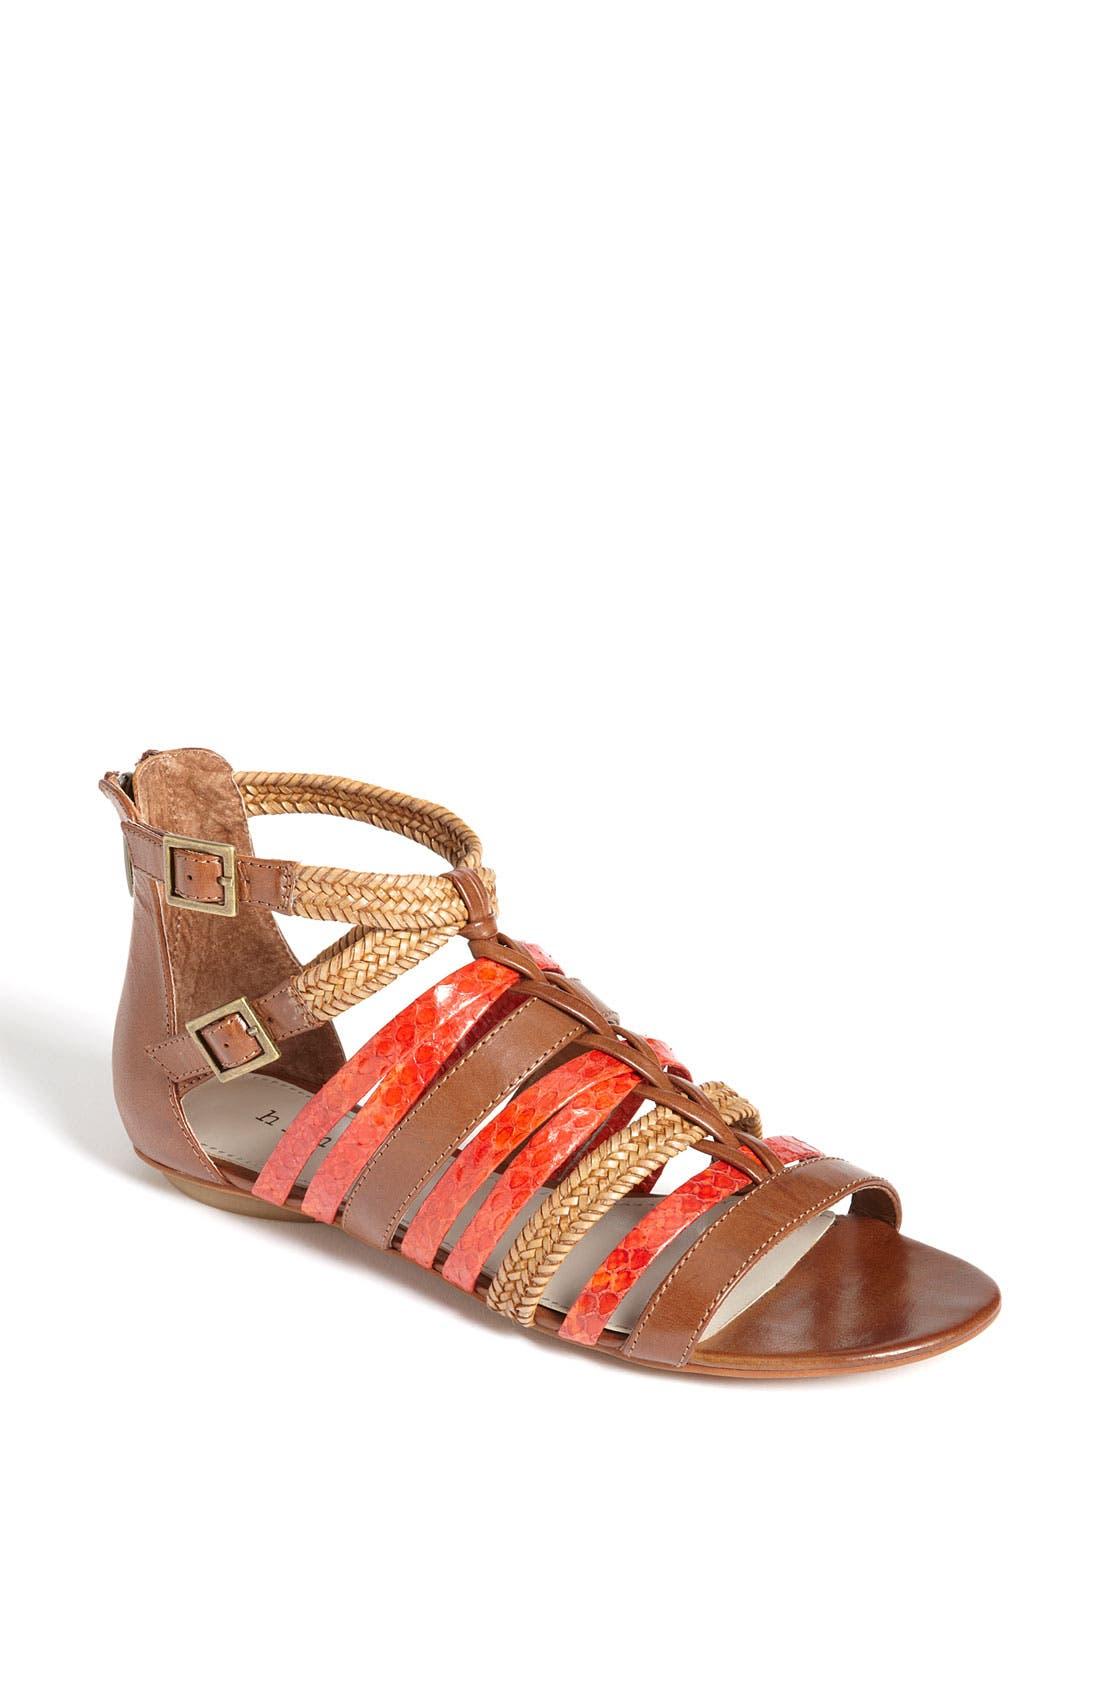 Main Image - Hinge® 'Tanner' Sandal